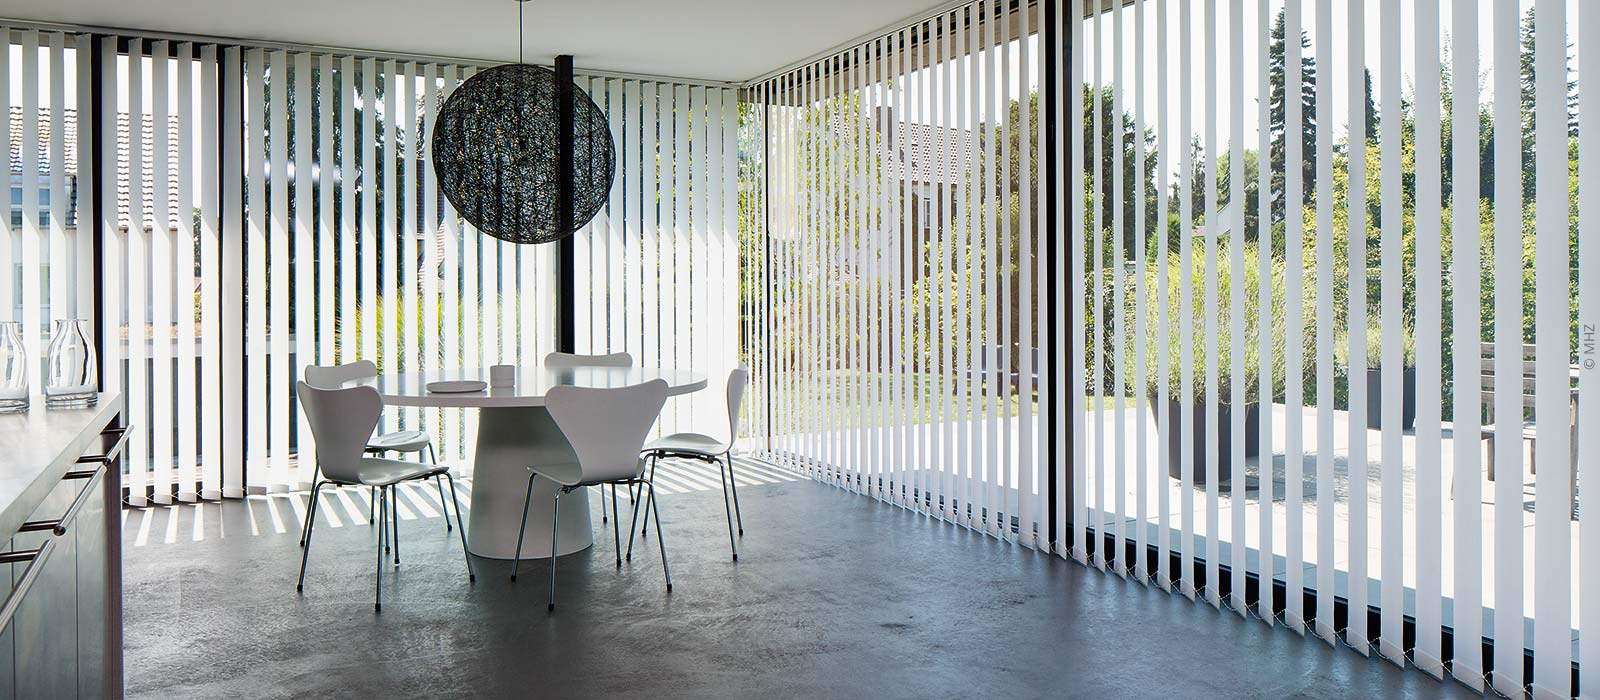 Vertikal-Jalousien statt Vorhängen